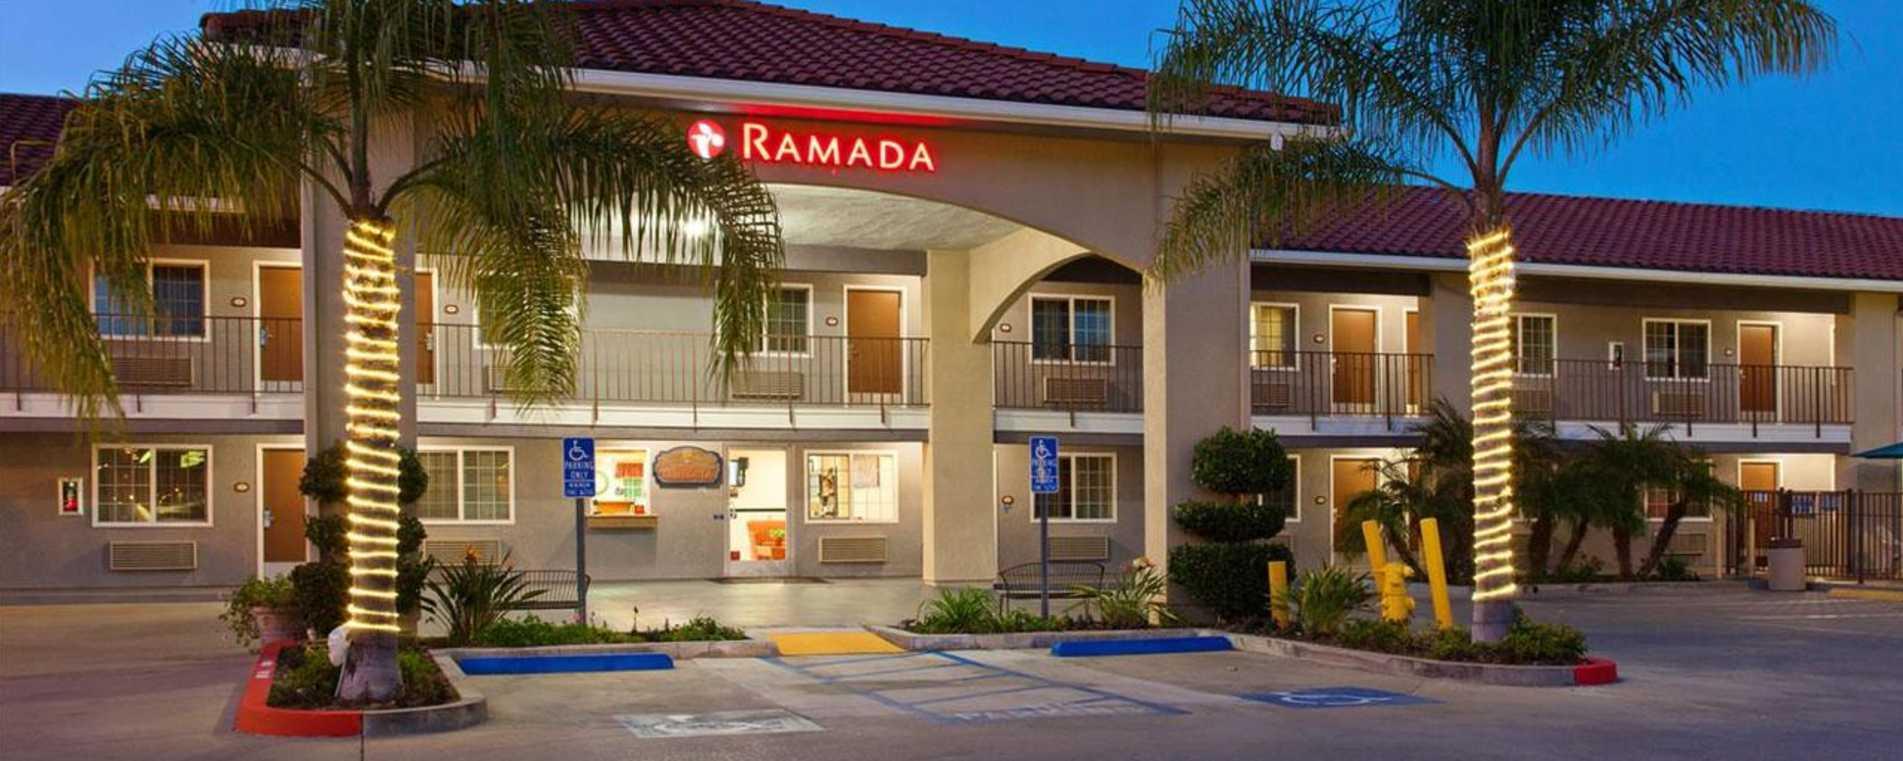 Ramada Inn- Temecula